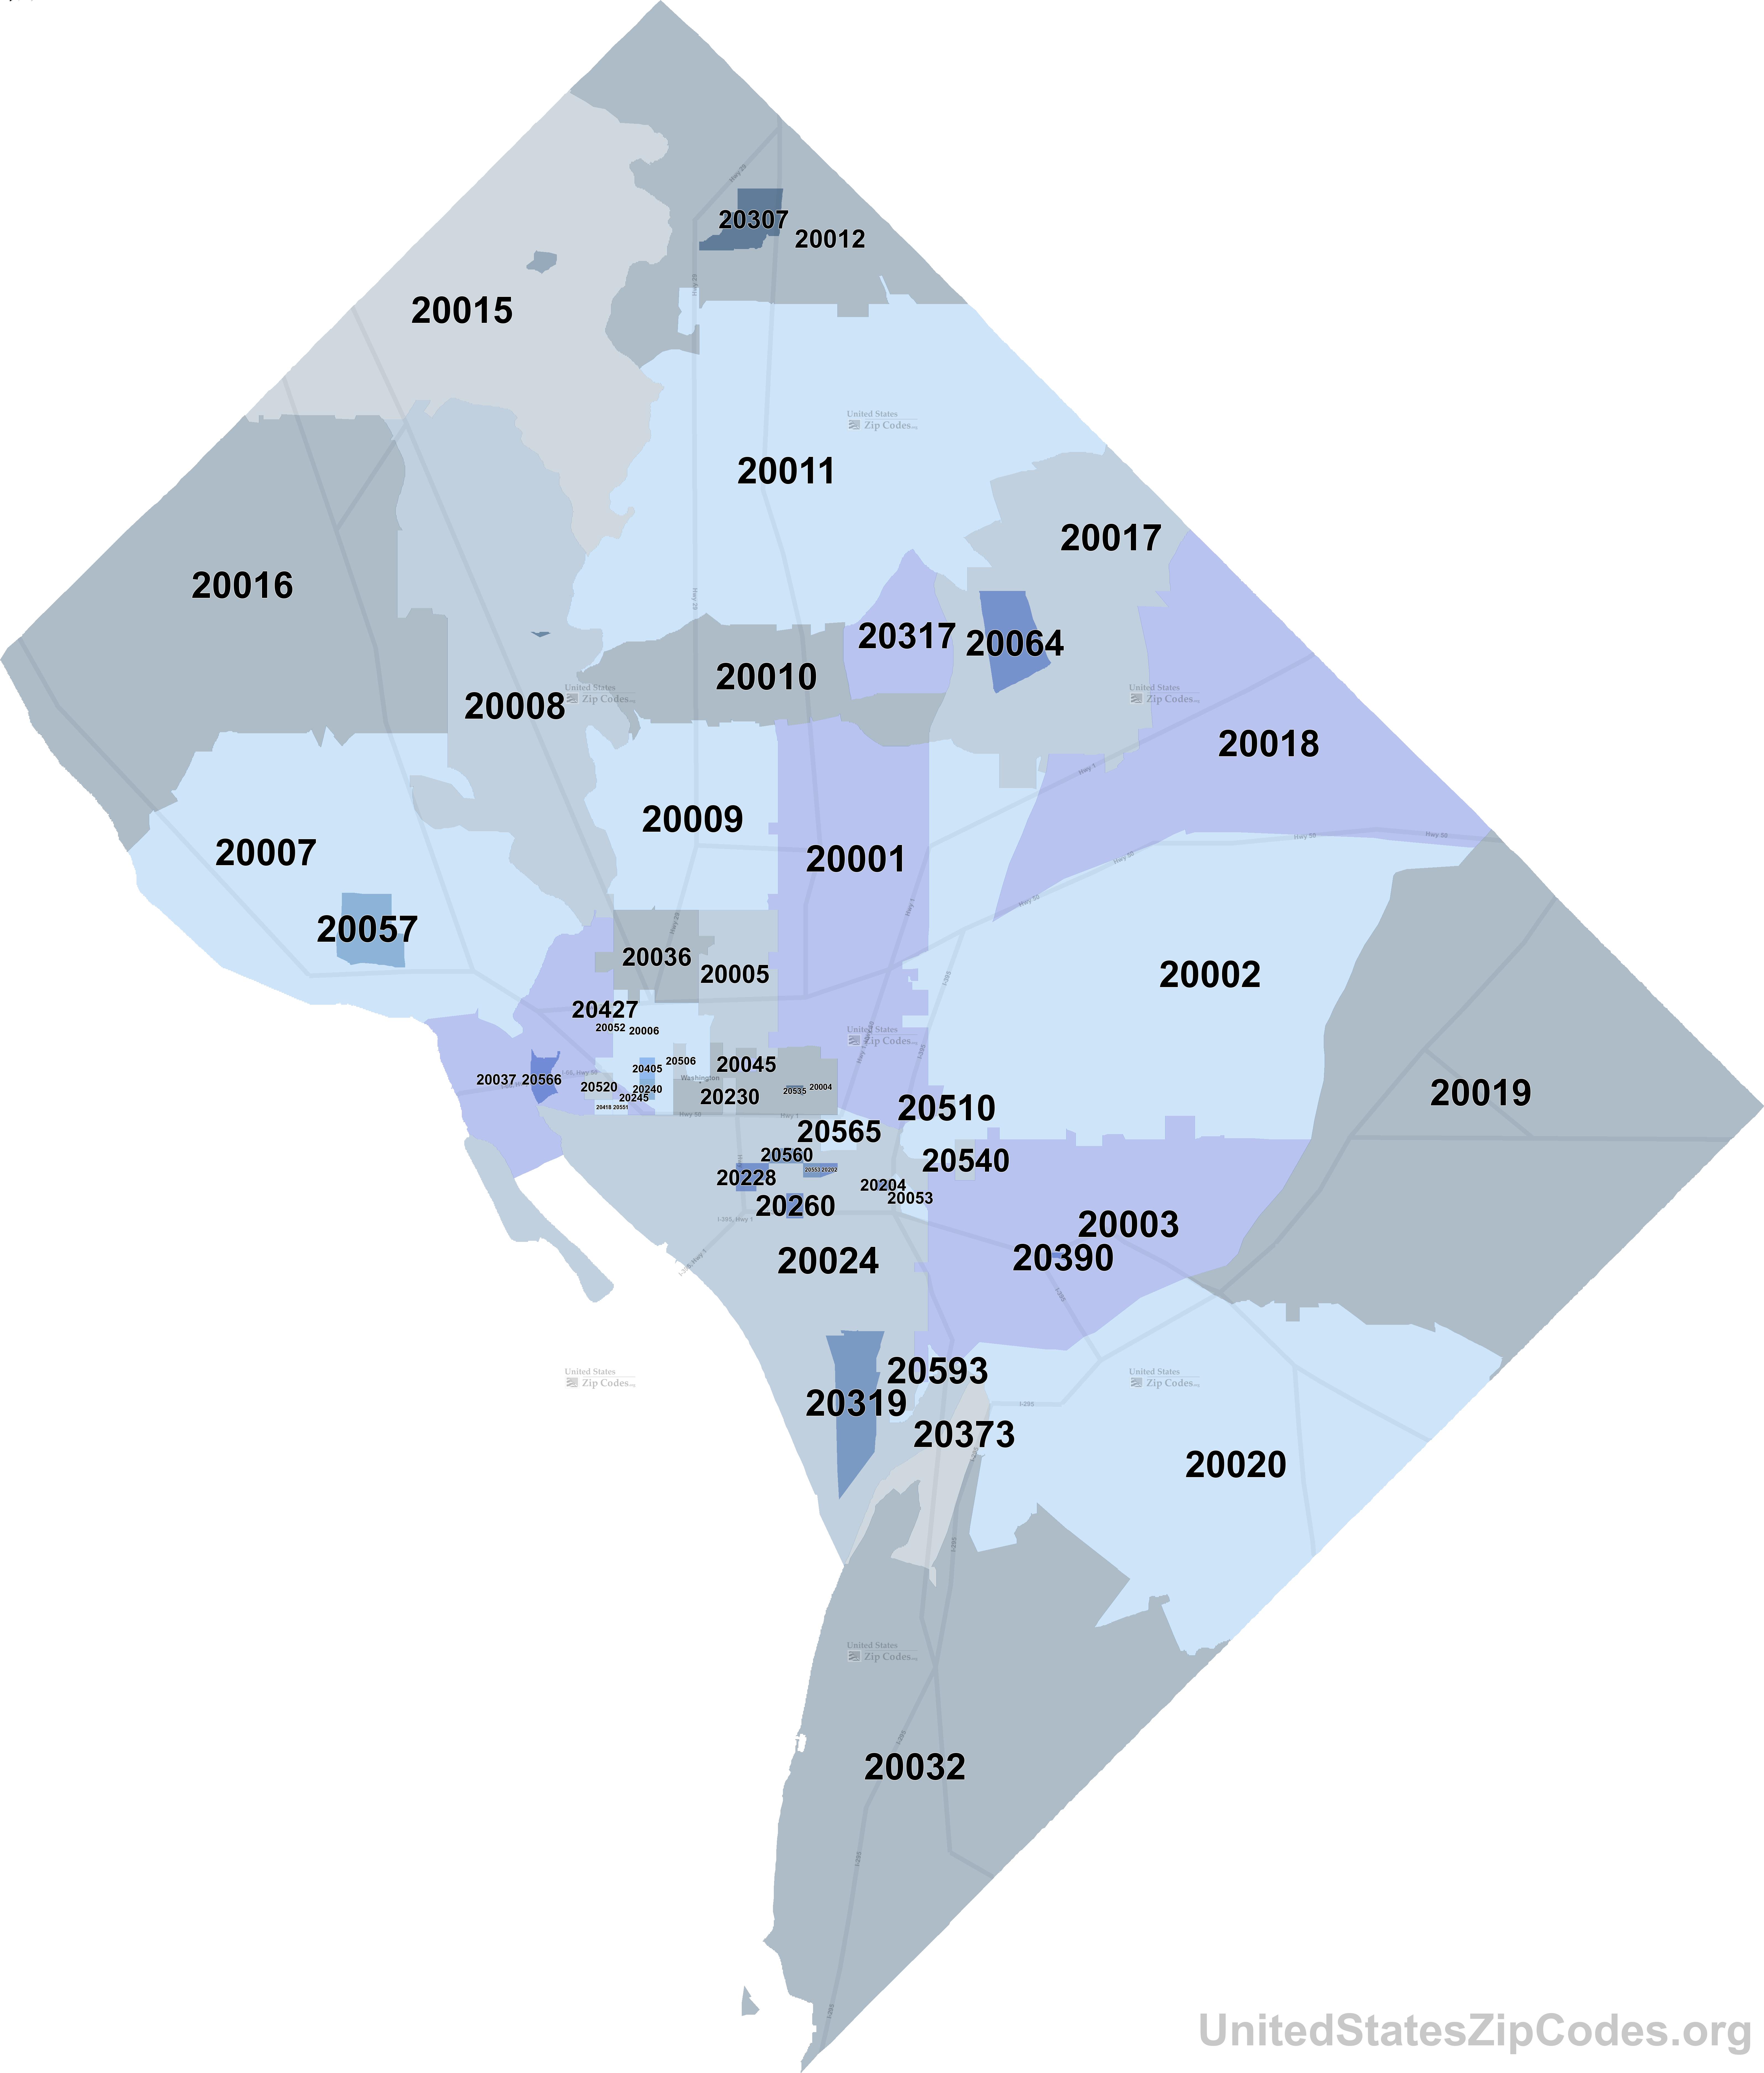 Zip Code Map Washington washington dc zip code map.png (6383×7500) (With images) | Zip